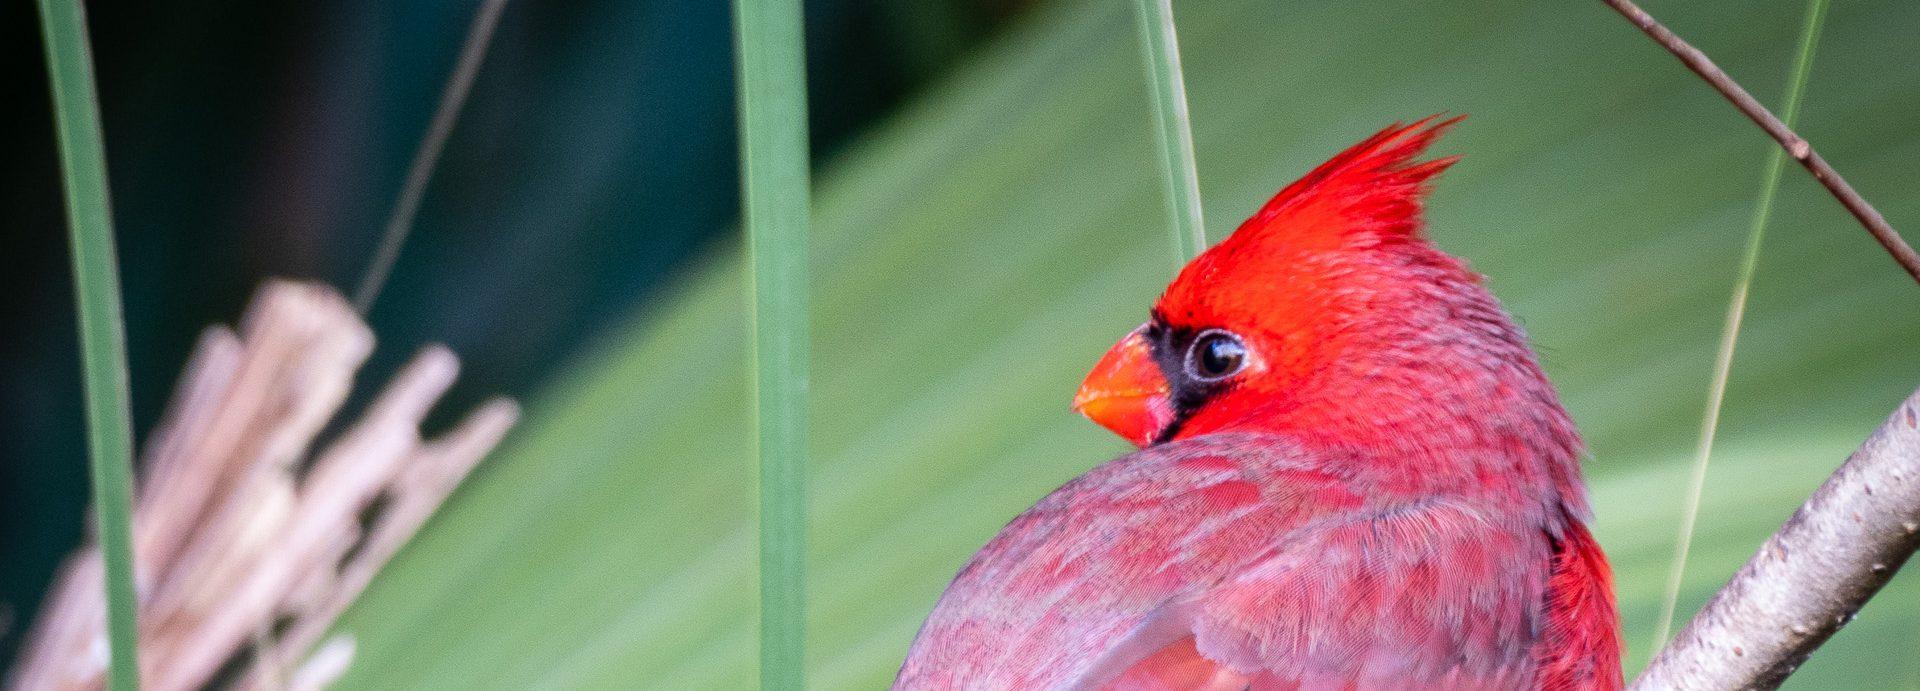 Seeing a Cardinal Always brings a smile